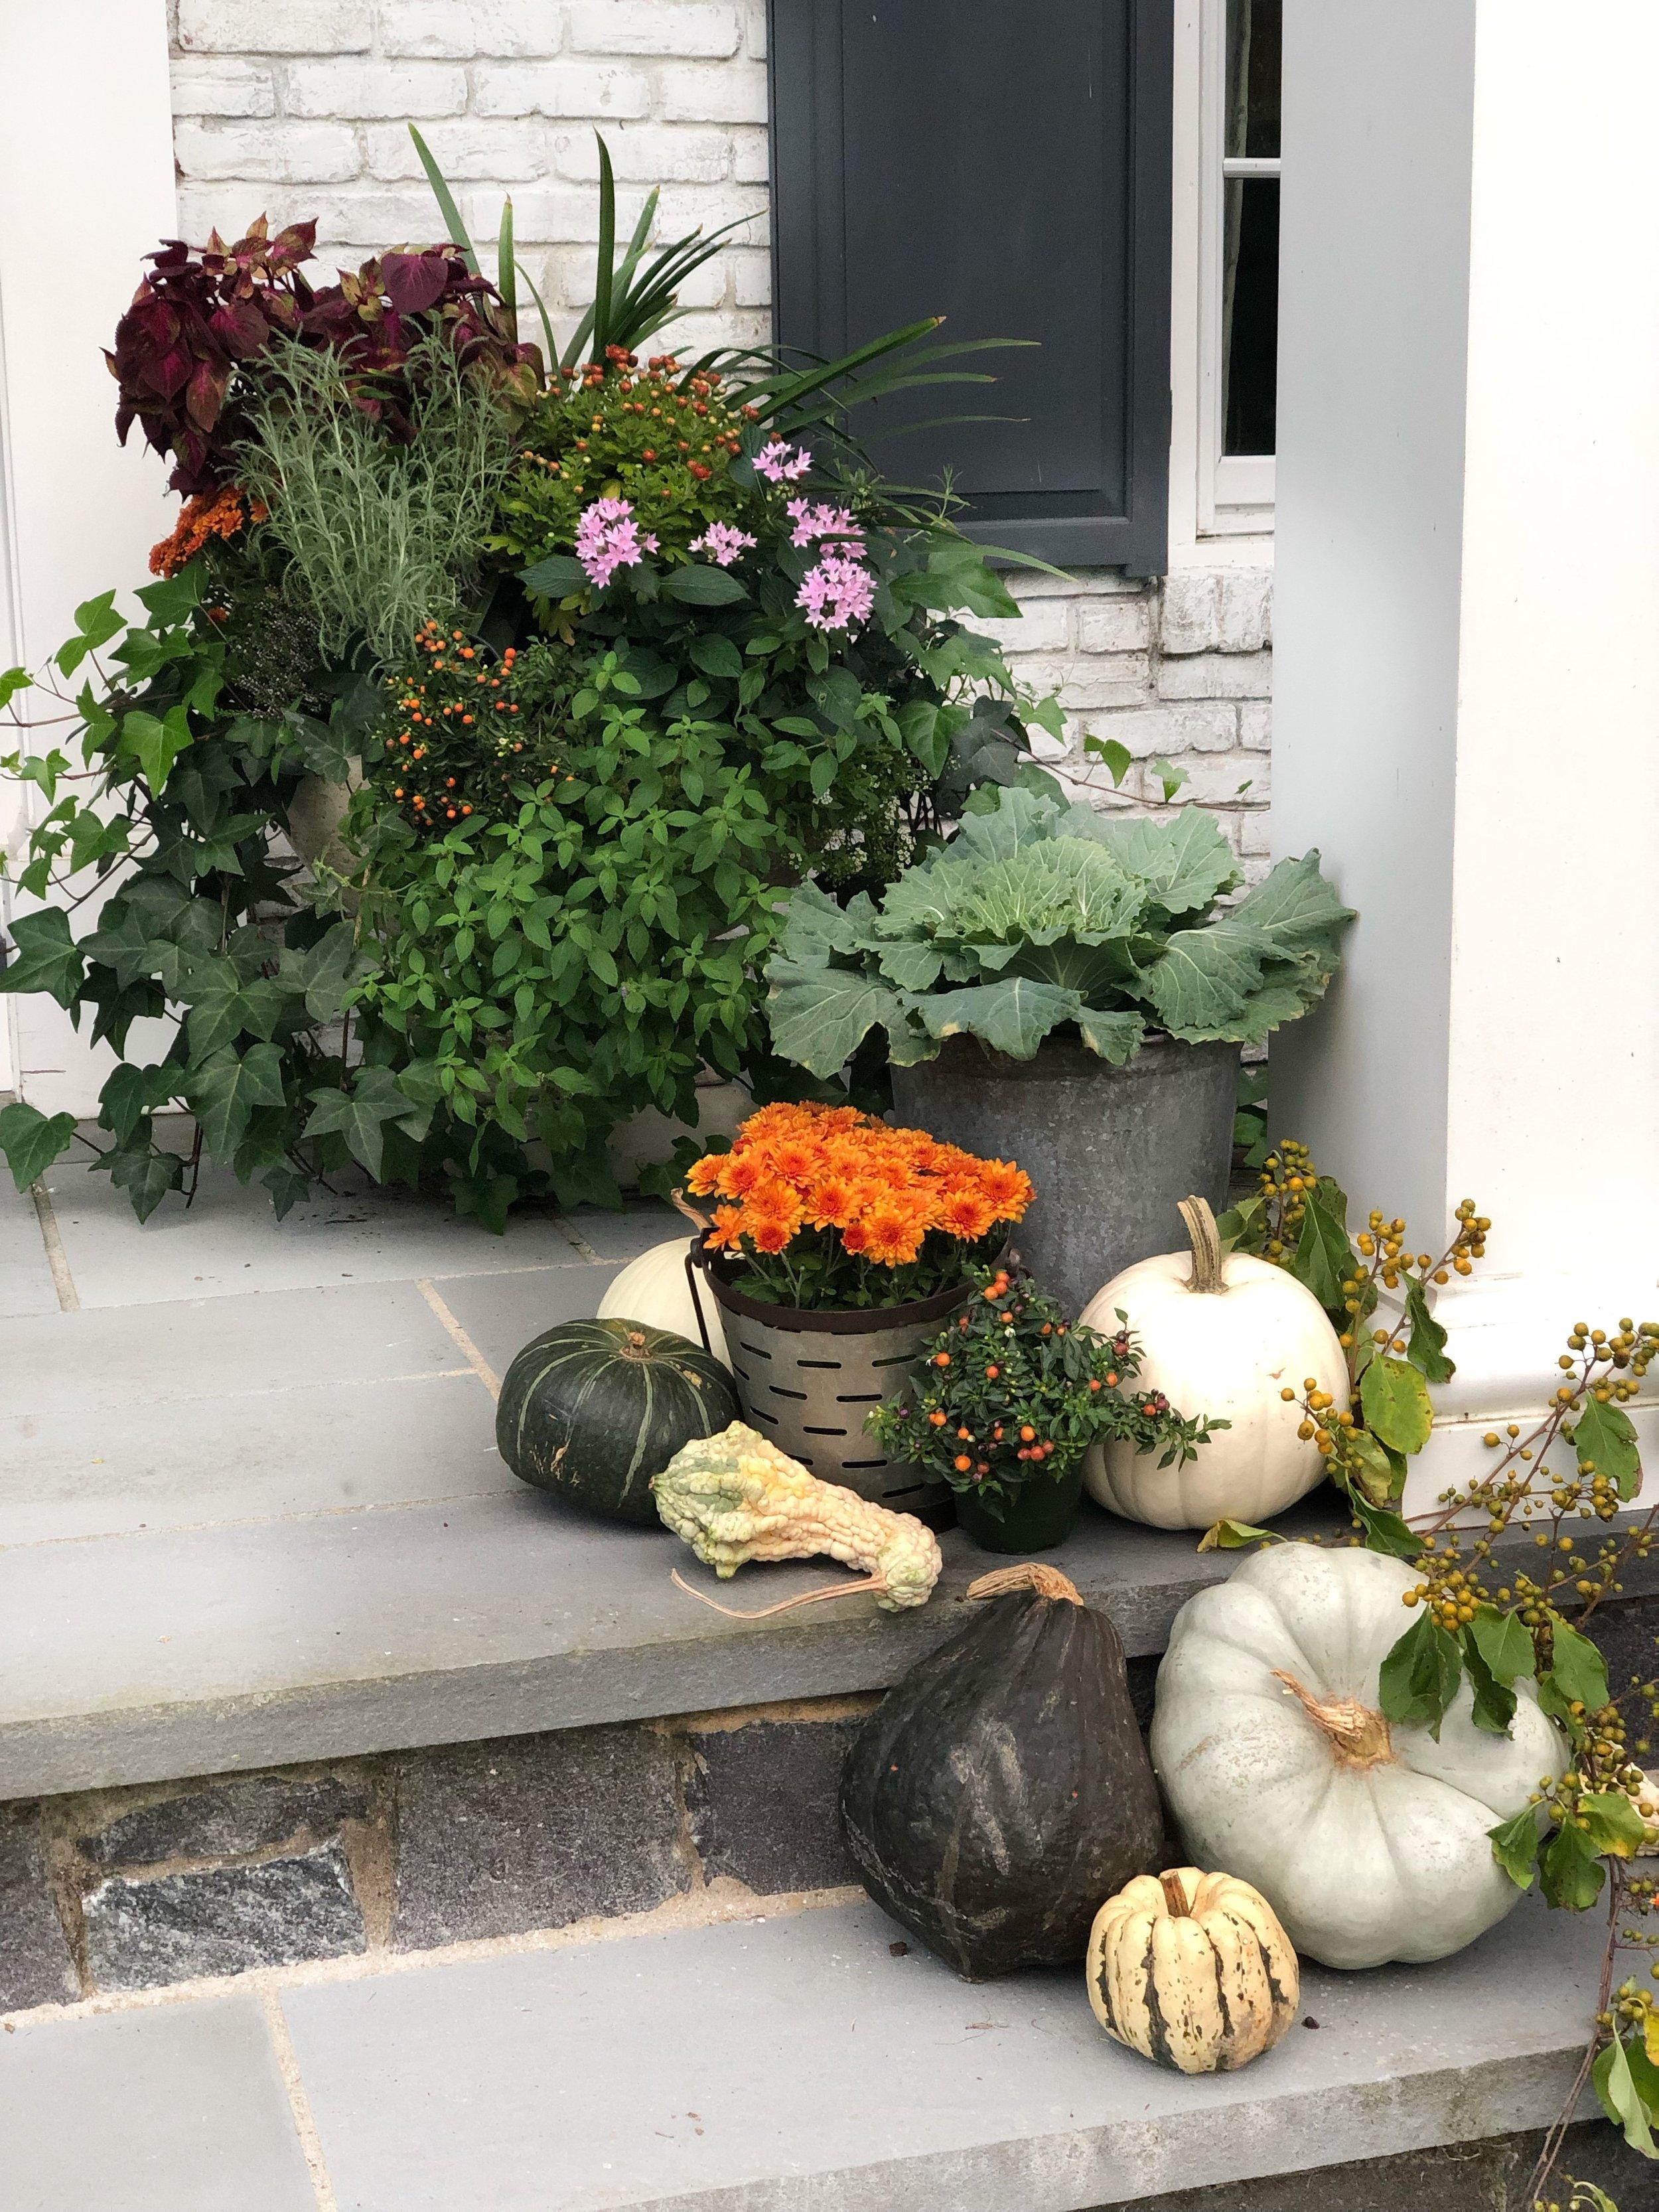 fall-decor-pumpkins-mums-squash.jpg